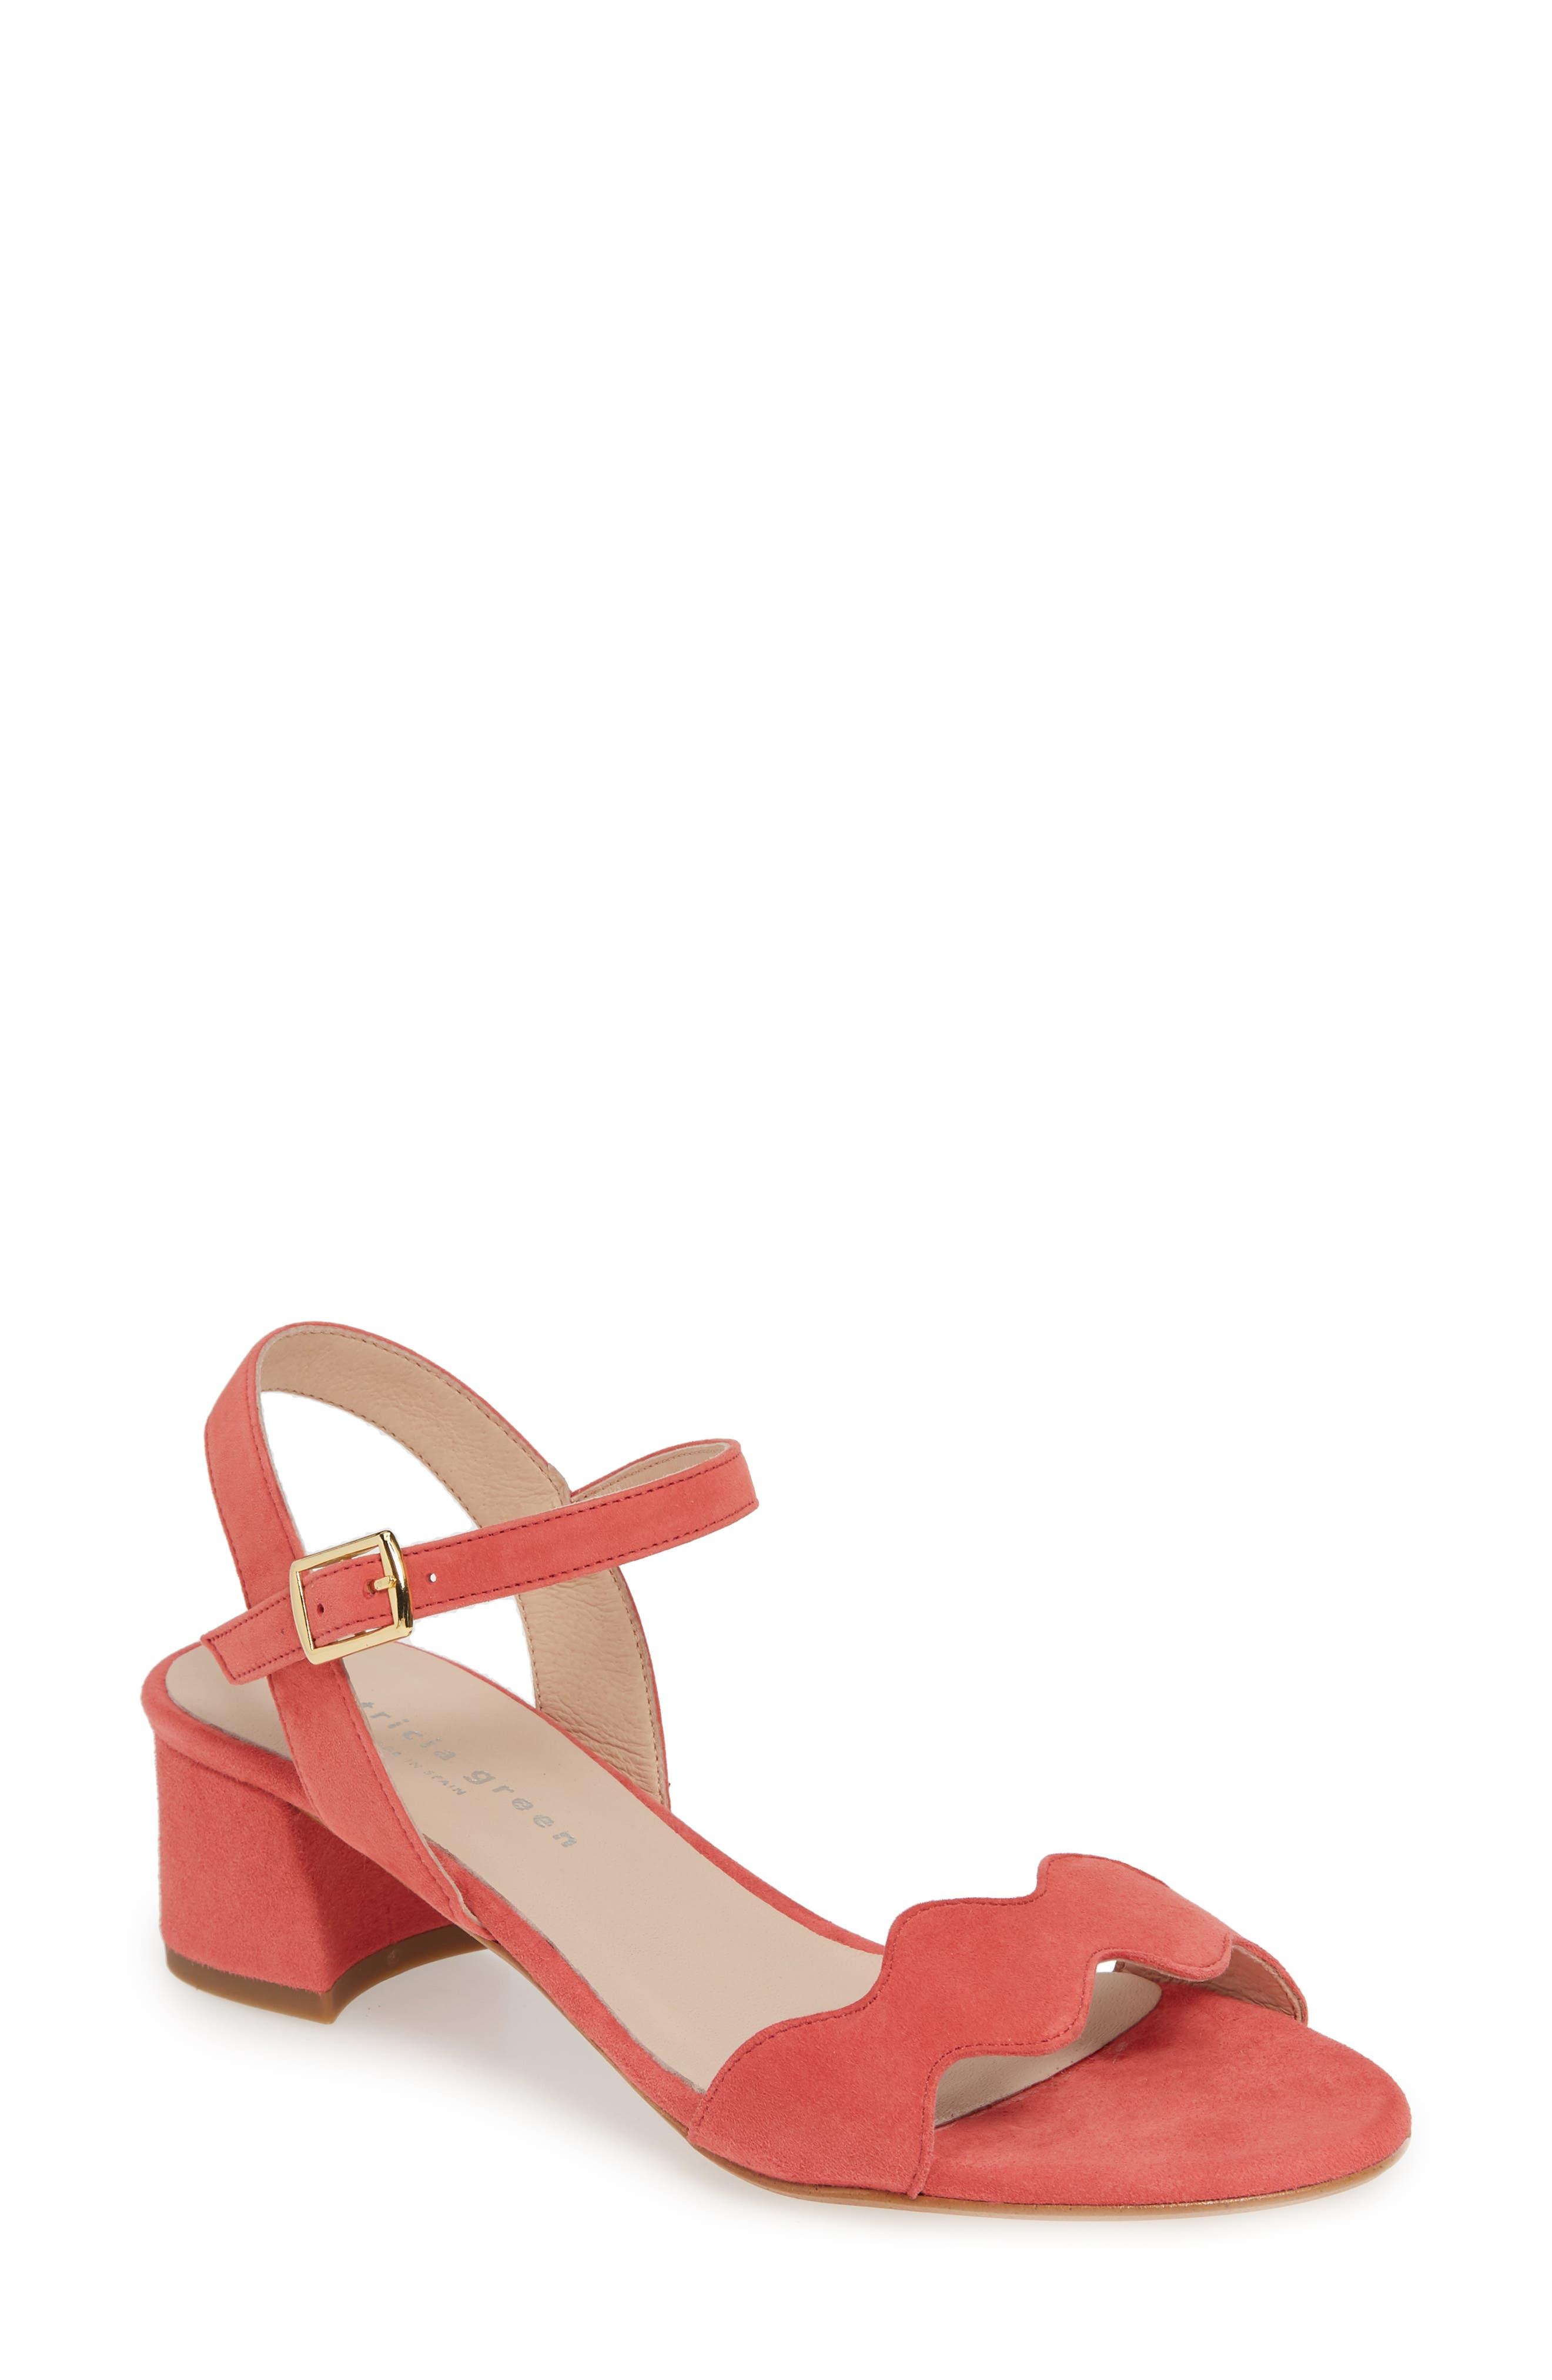 Patricia Green Gina Block Heel Sandal, Coral